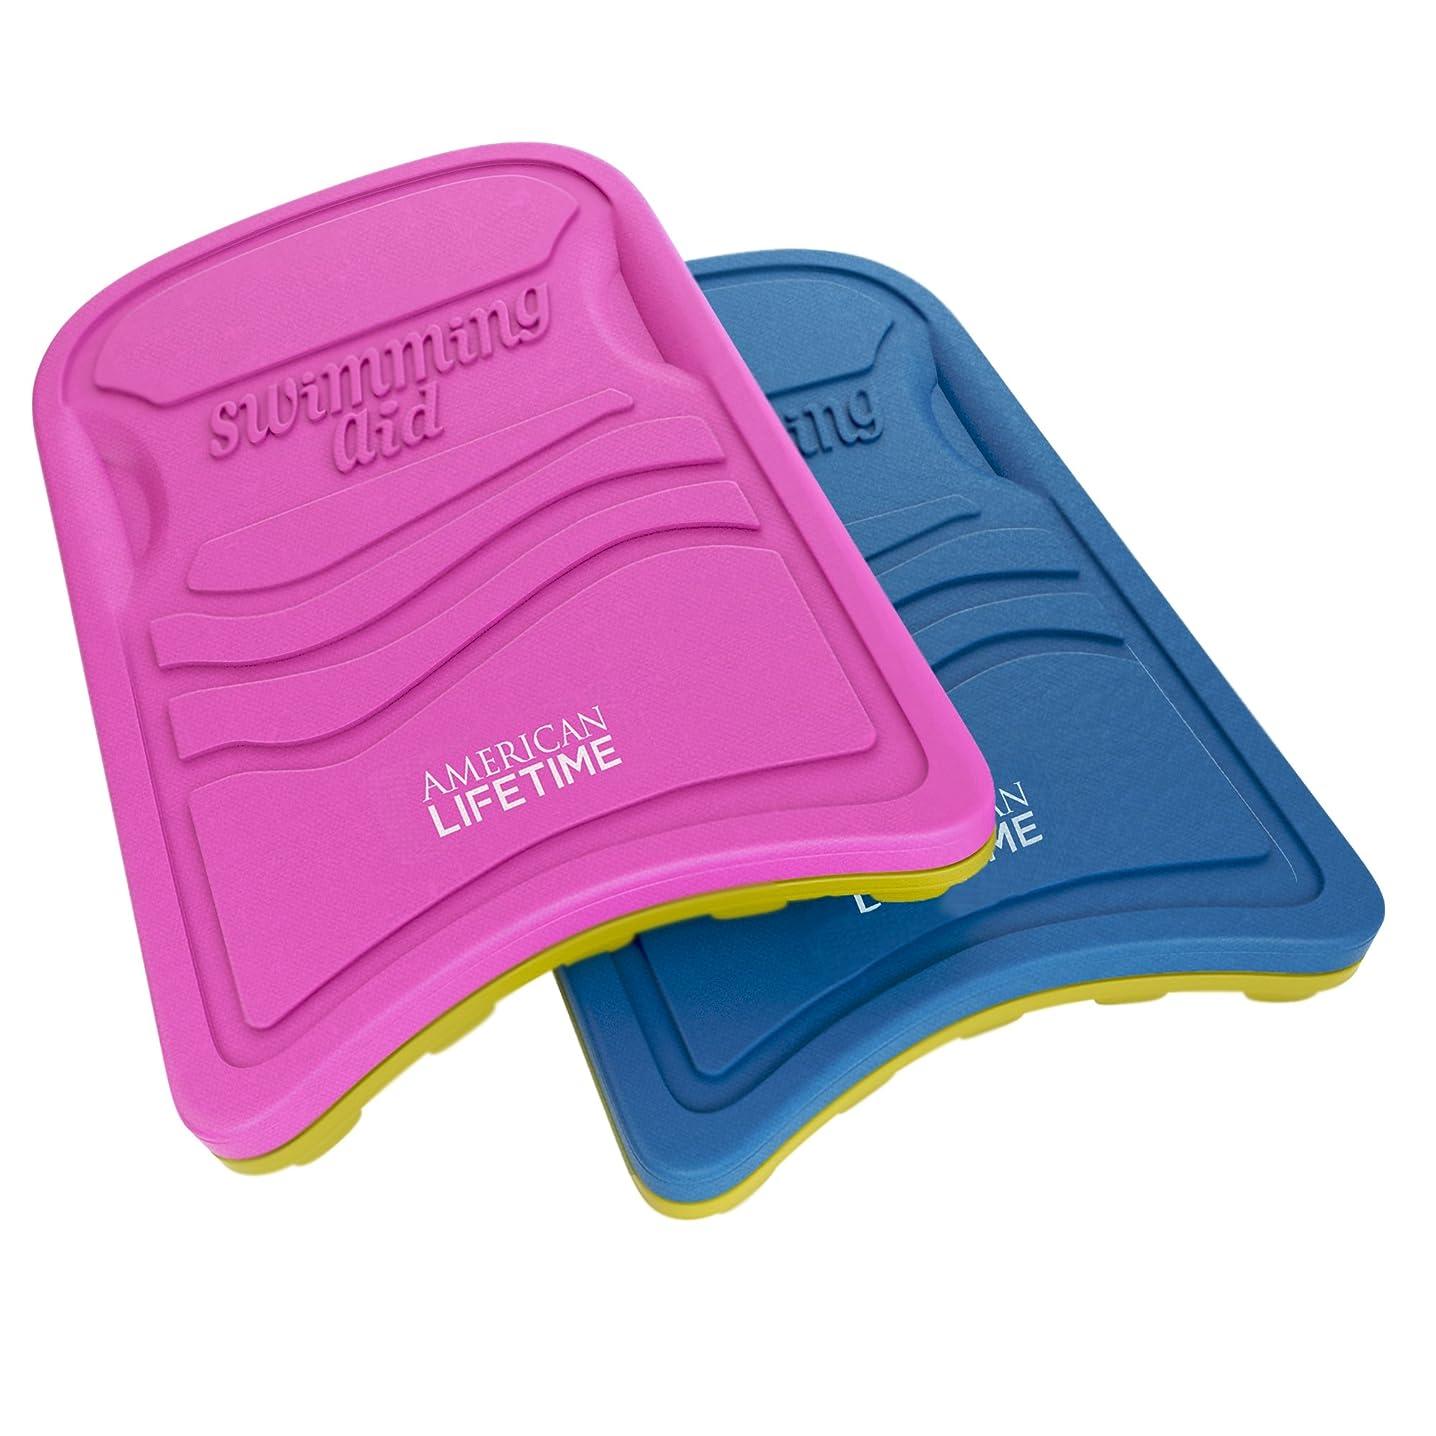 Kickboard - Lightweight Foam Swim Board - Swimming Training Aid for Adults and Kids